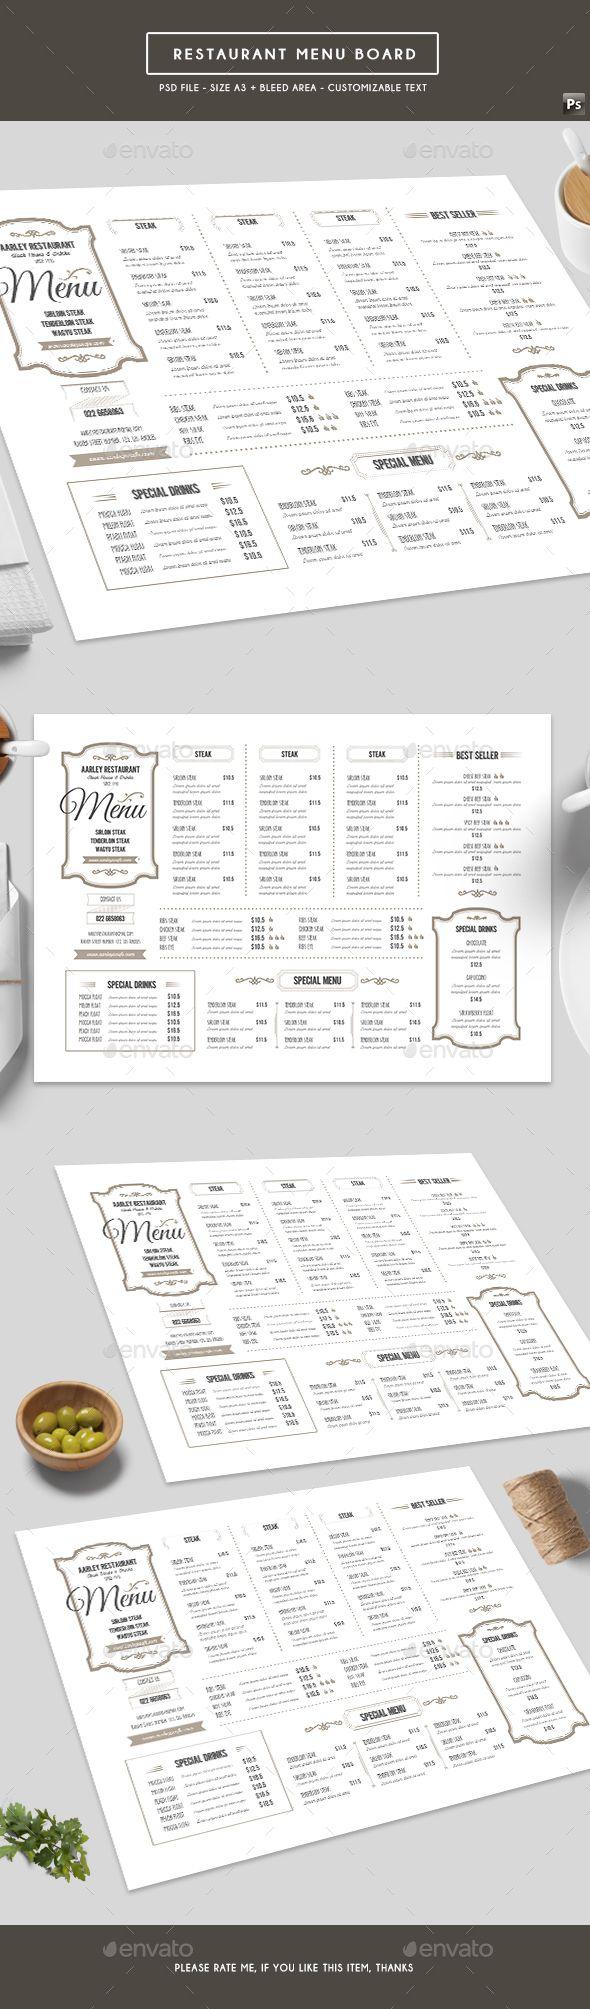 Restaurant Menu Board — Photoshop PSD #steak #menu design • Download ➝ https://graphicriver.net/item/restaurant-menu-board/19411860?ref=pxcr